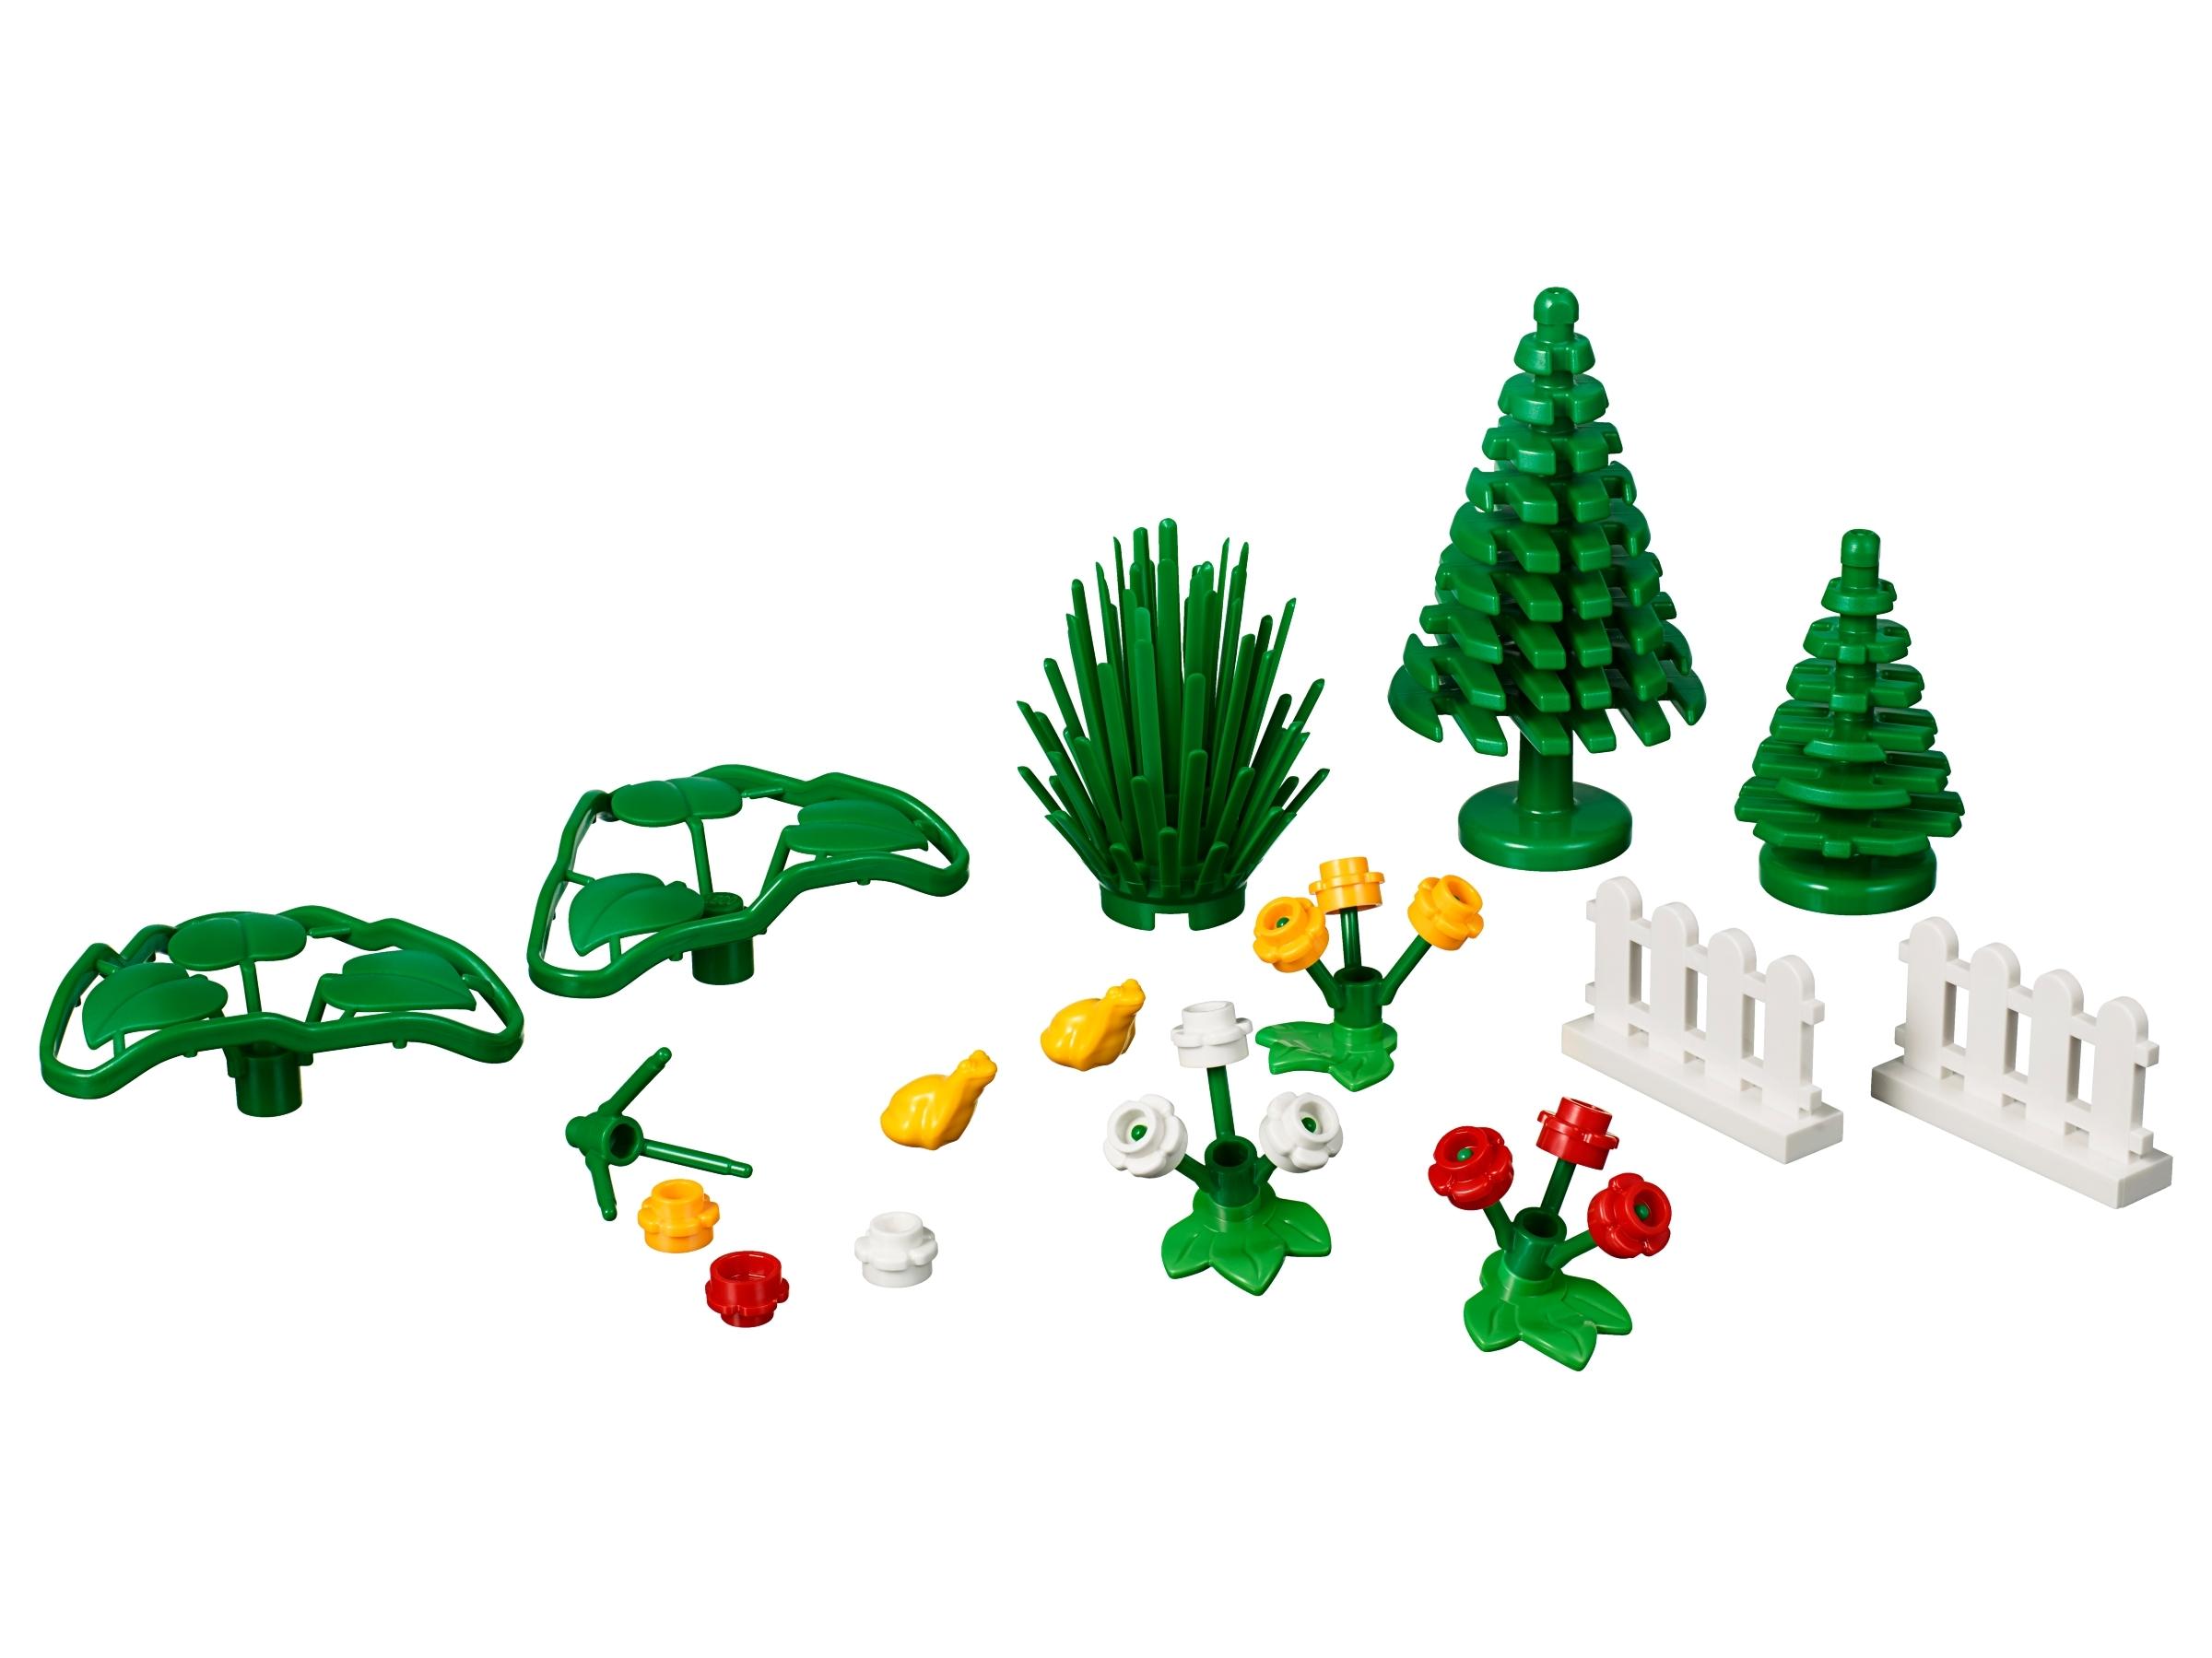 Lego Xtra City Town Accessories Botanicals Plants Flowers NEW 32 pcs 40376